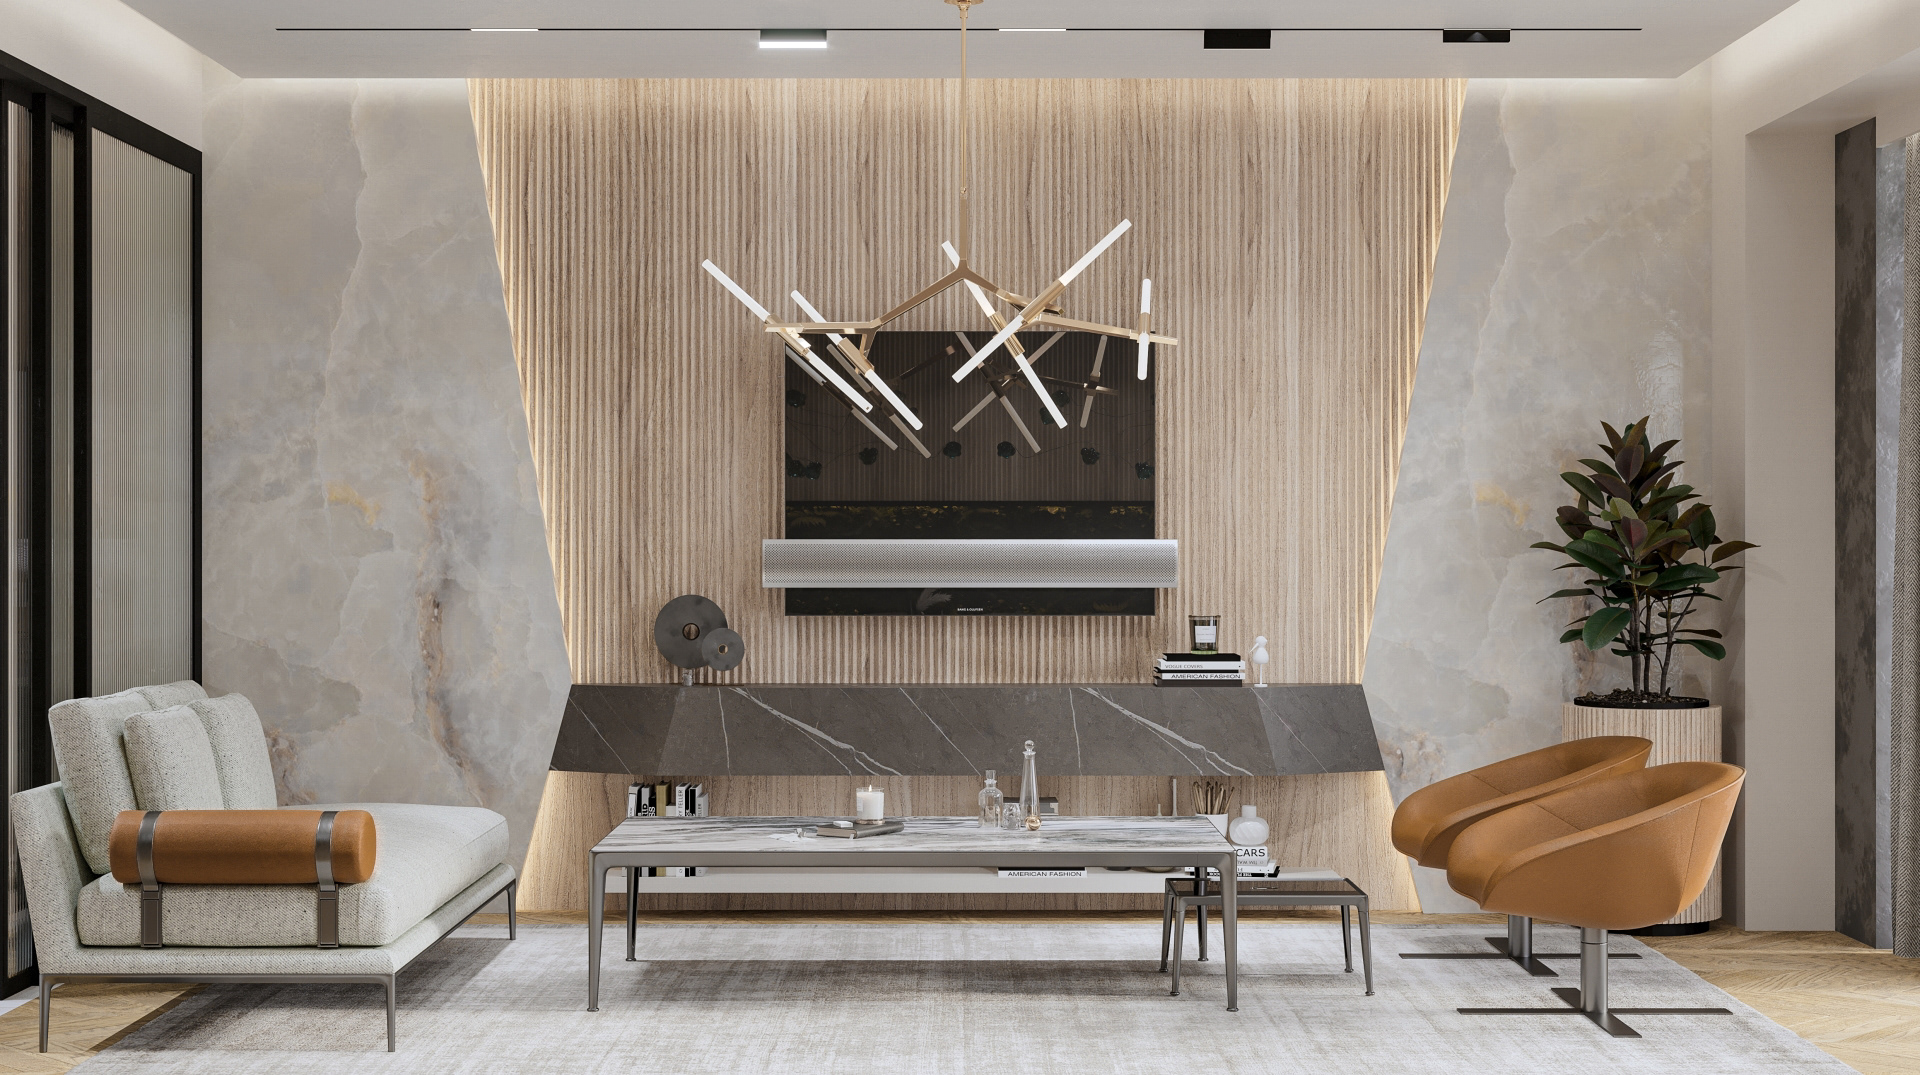 tbilisi The Best Interior Designers in Tbilisi 0170ac5b bca0 4e0c a3ab fa82e527e764 rw 1920